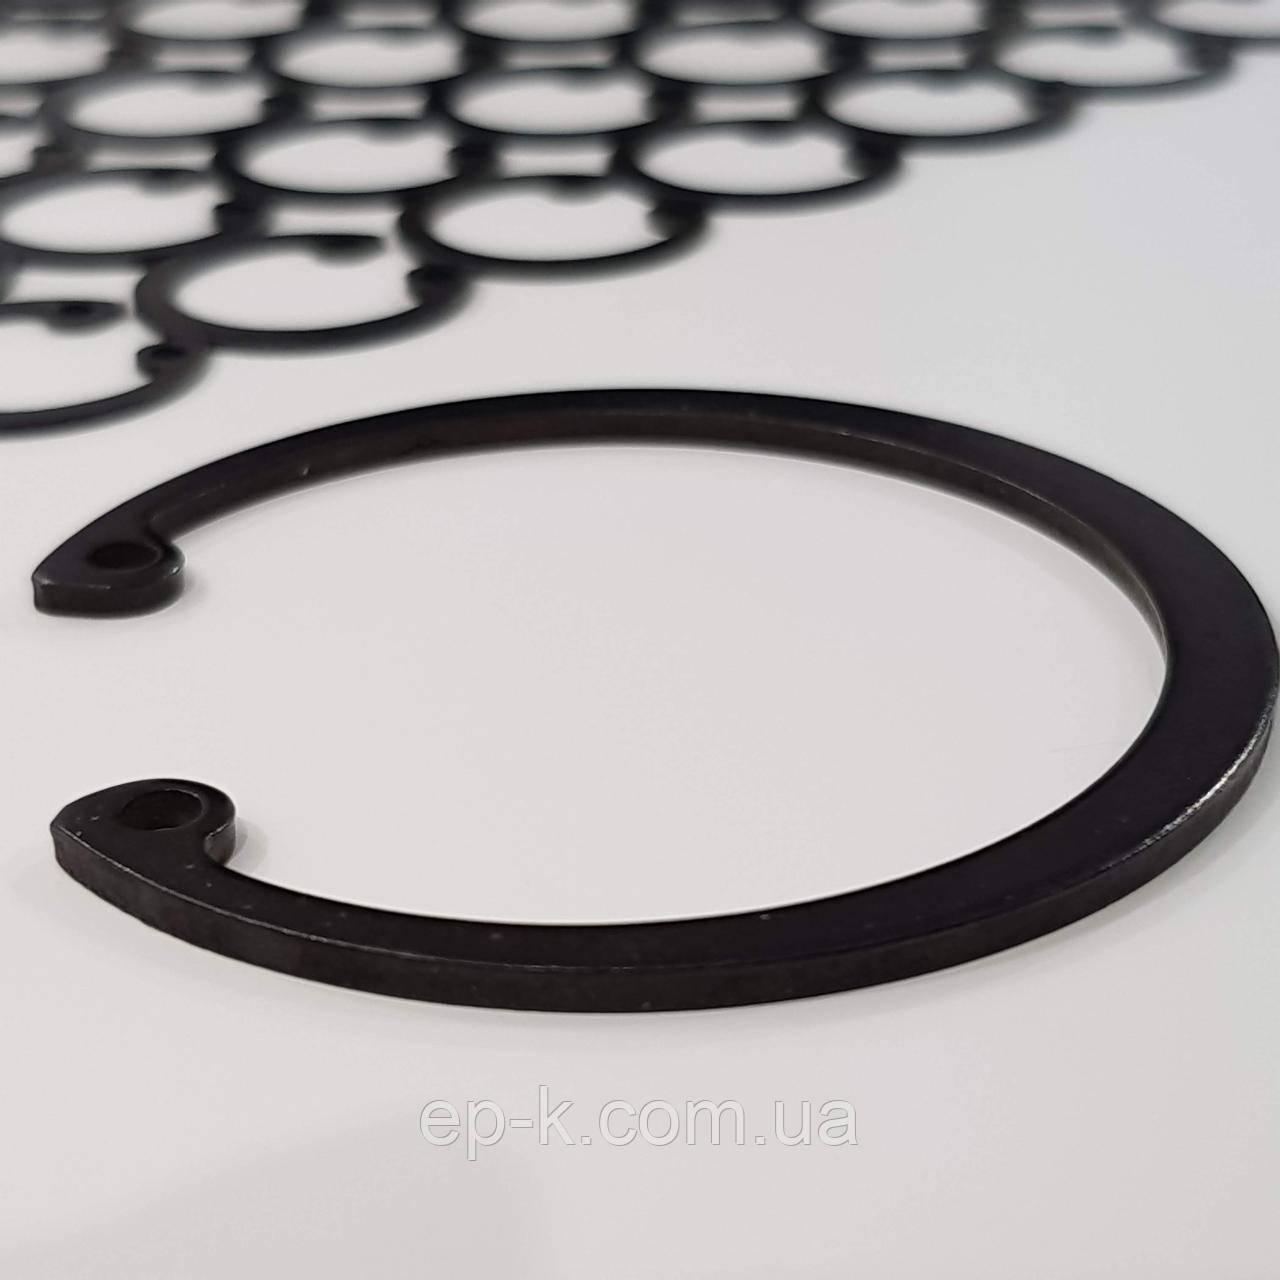 Стопорное кольцо внутреннее А8  ГОСТ 13943-86, DIN 472